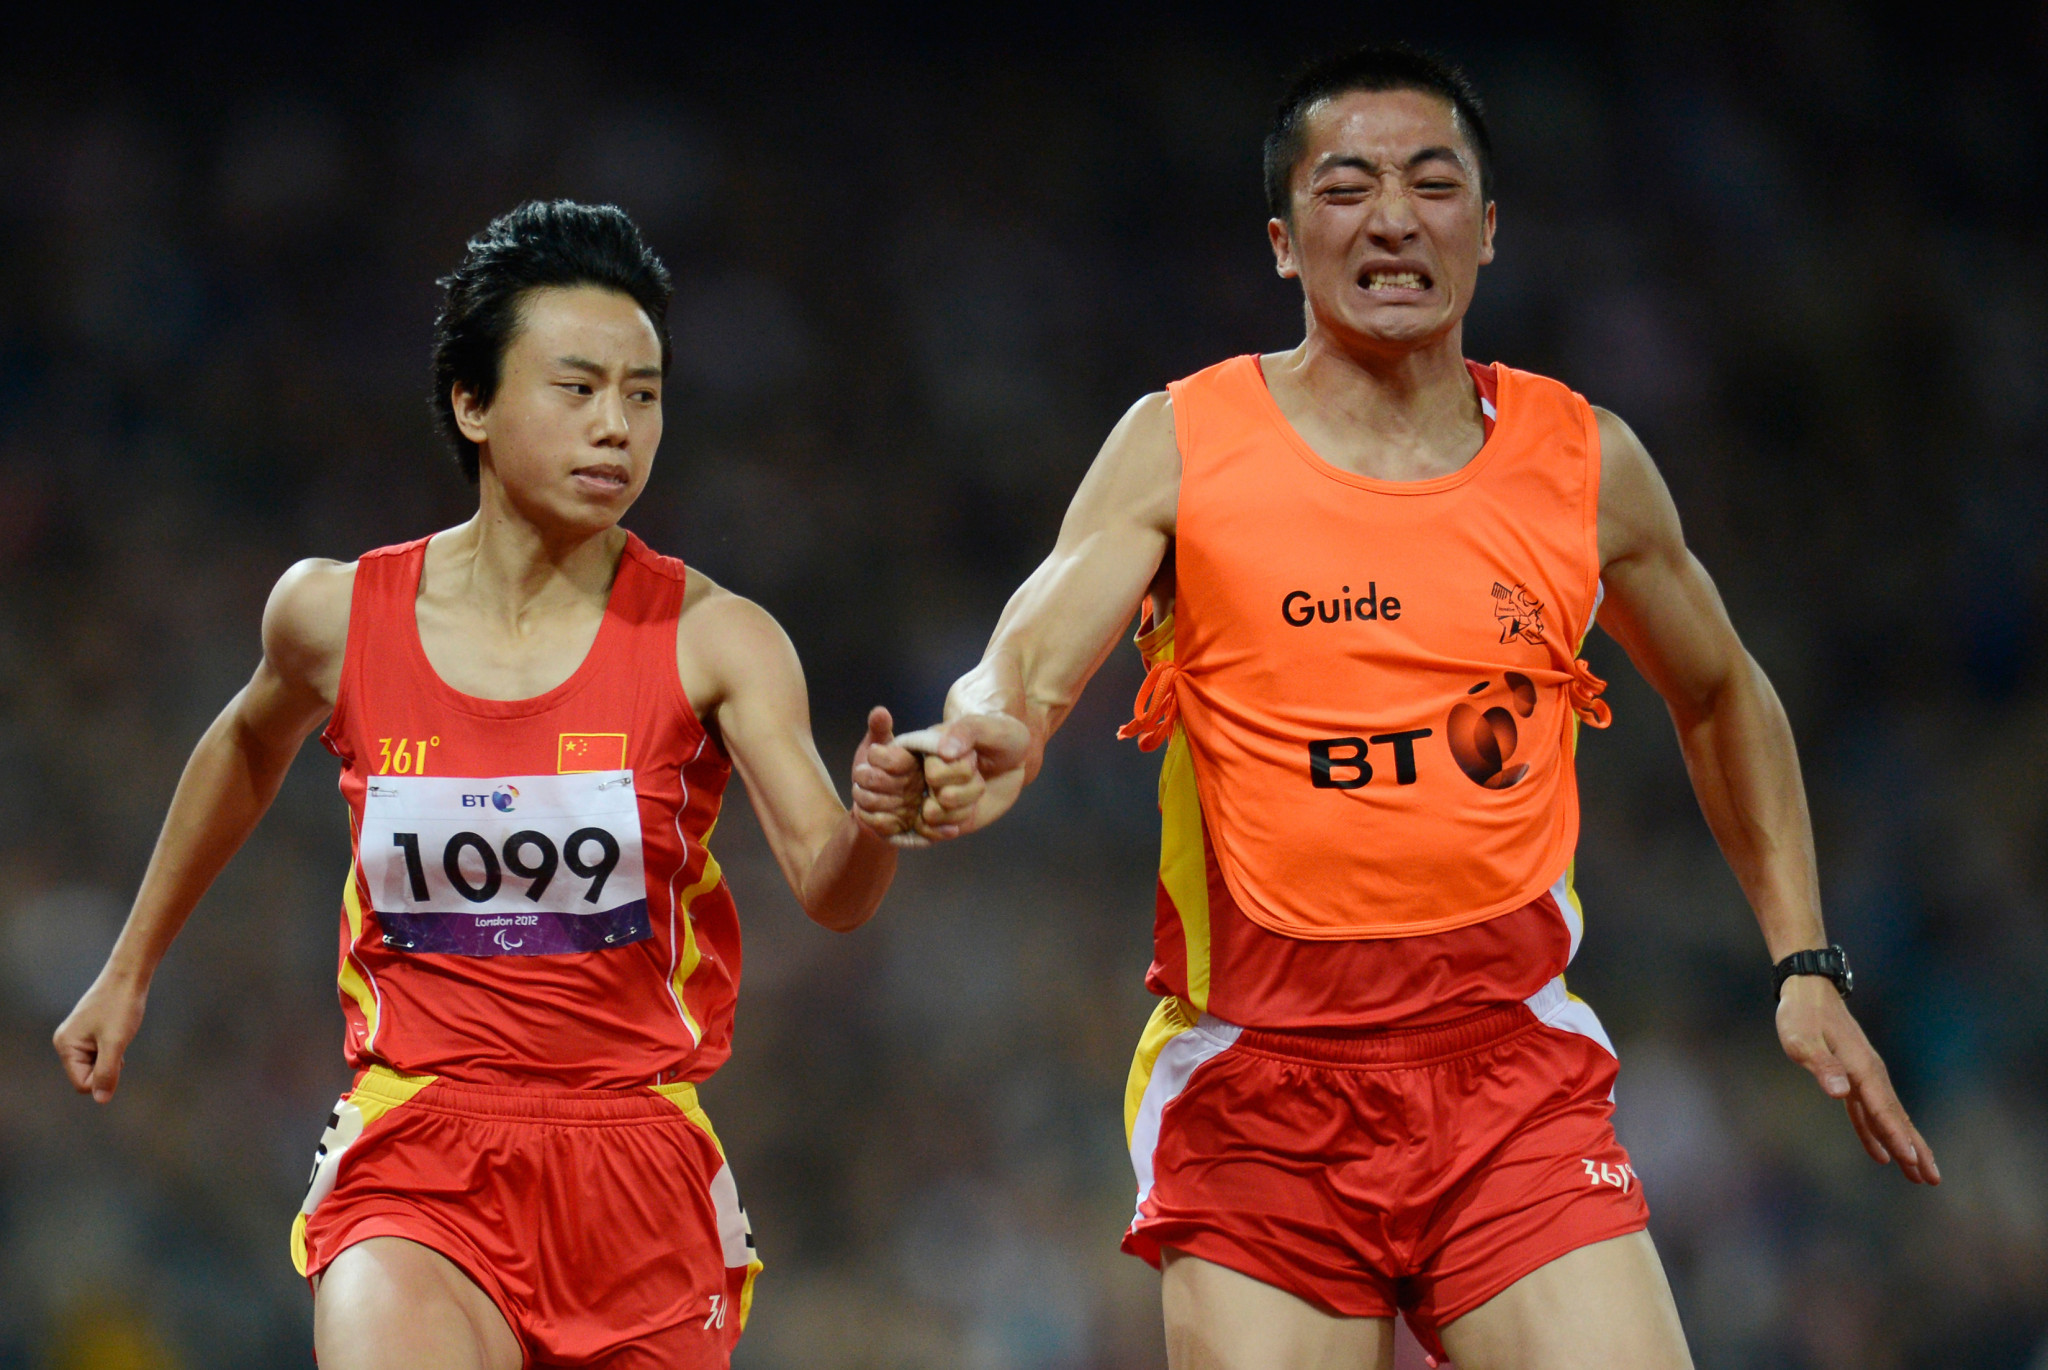 Sprinter Zhou records world leading long jump attempt at home World Para Athletics Grand Prix